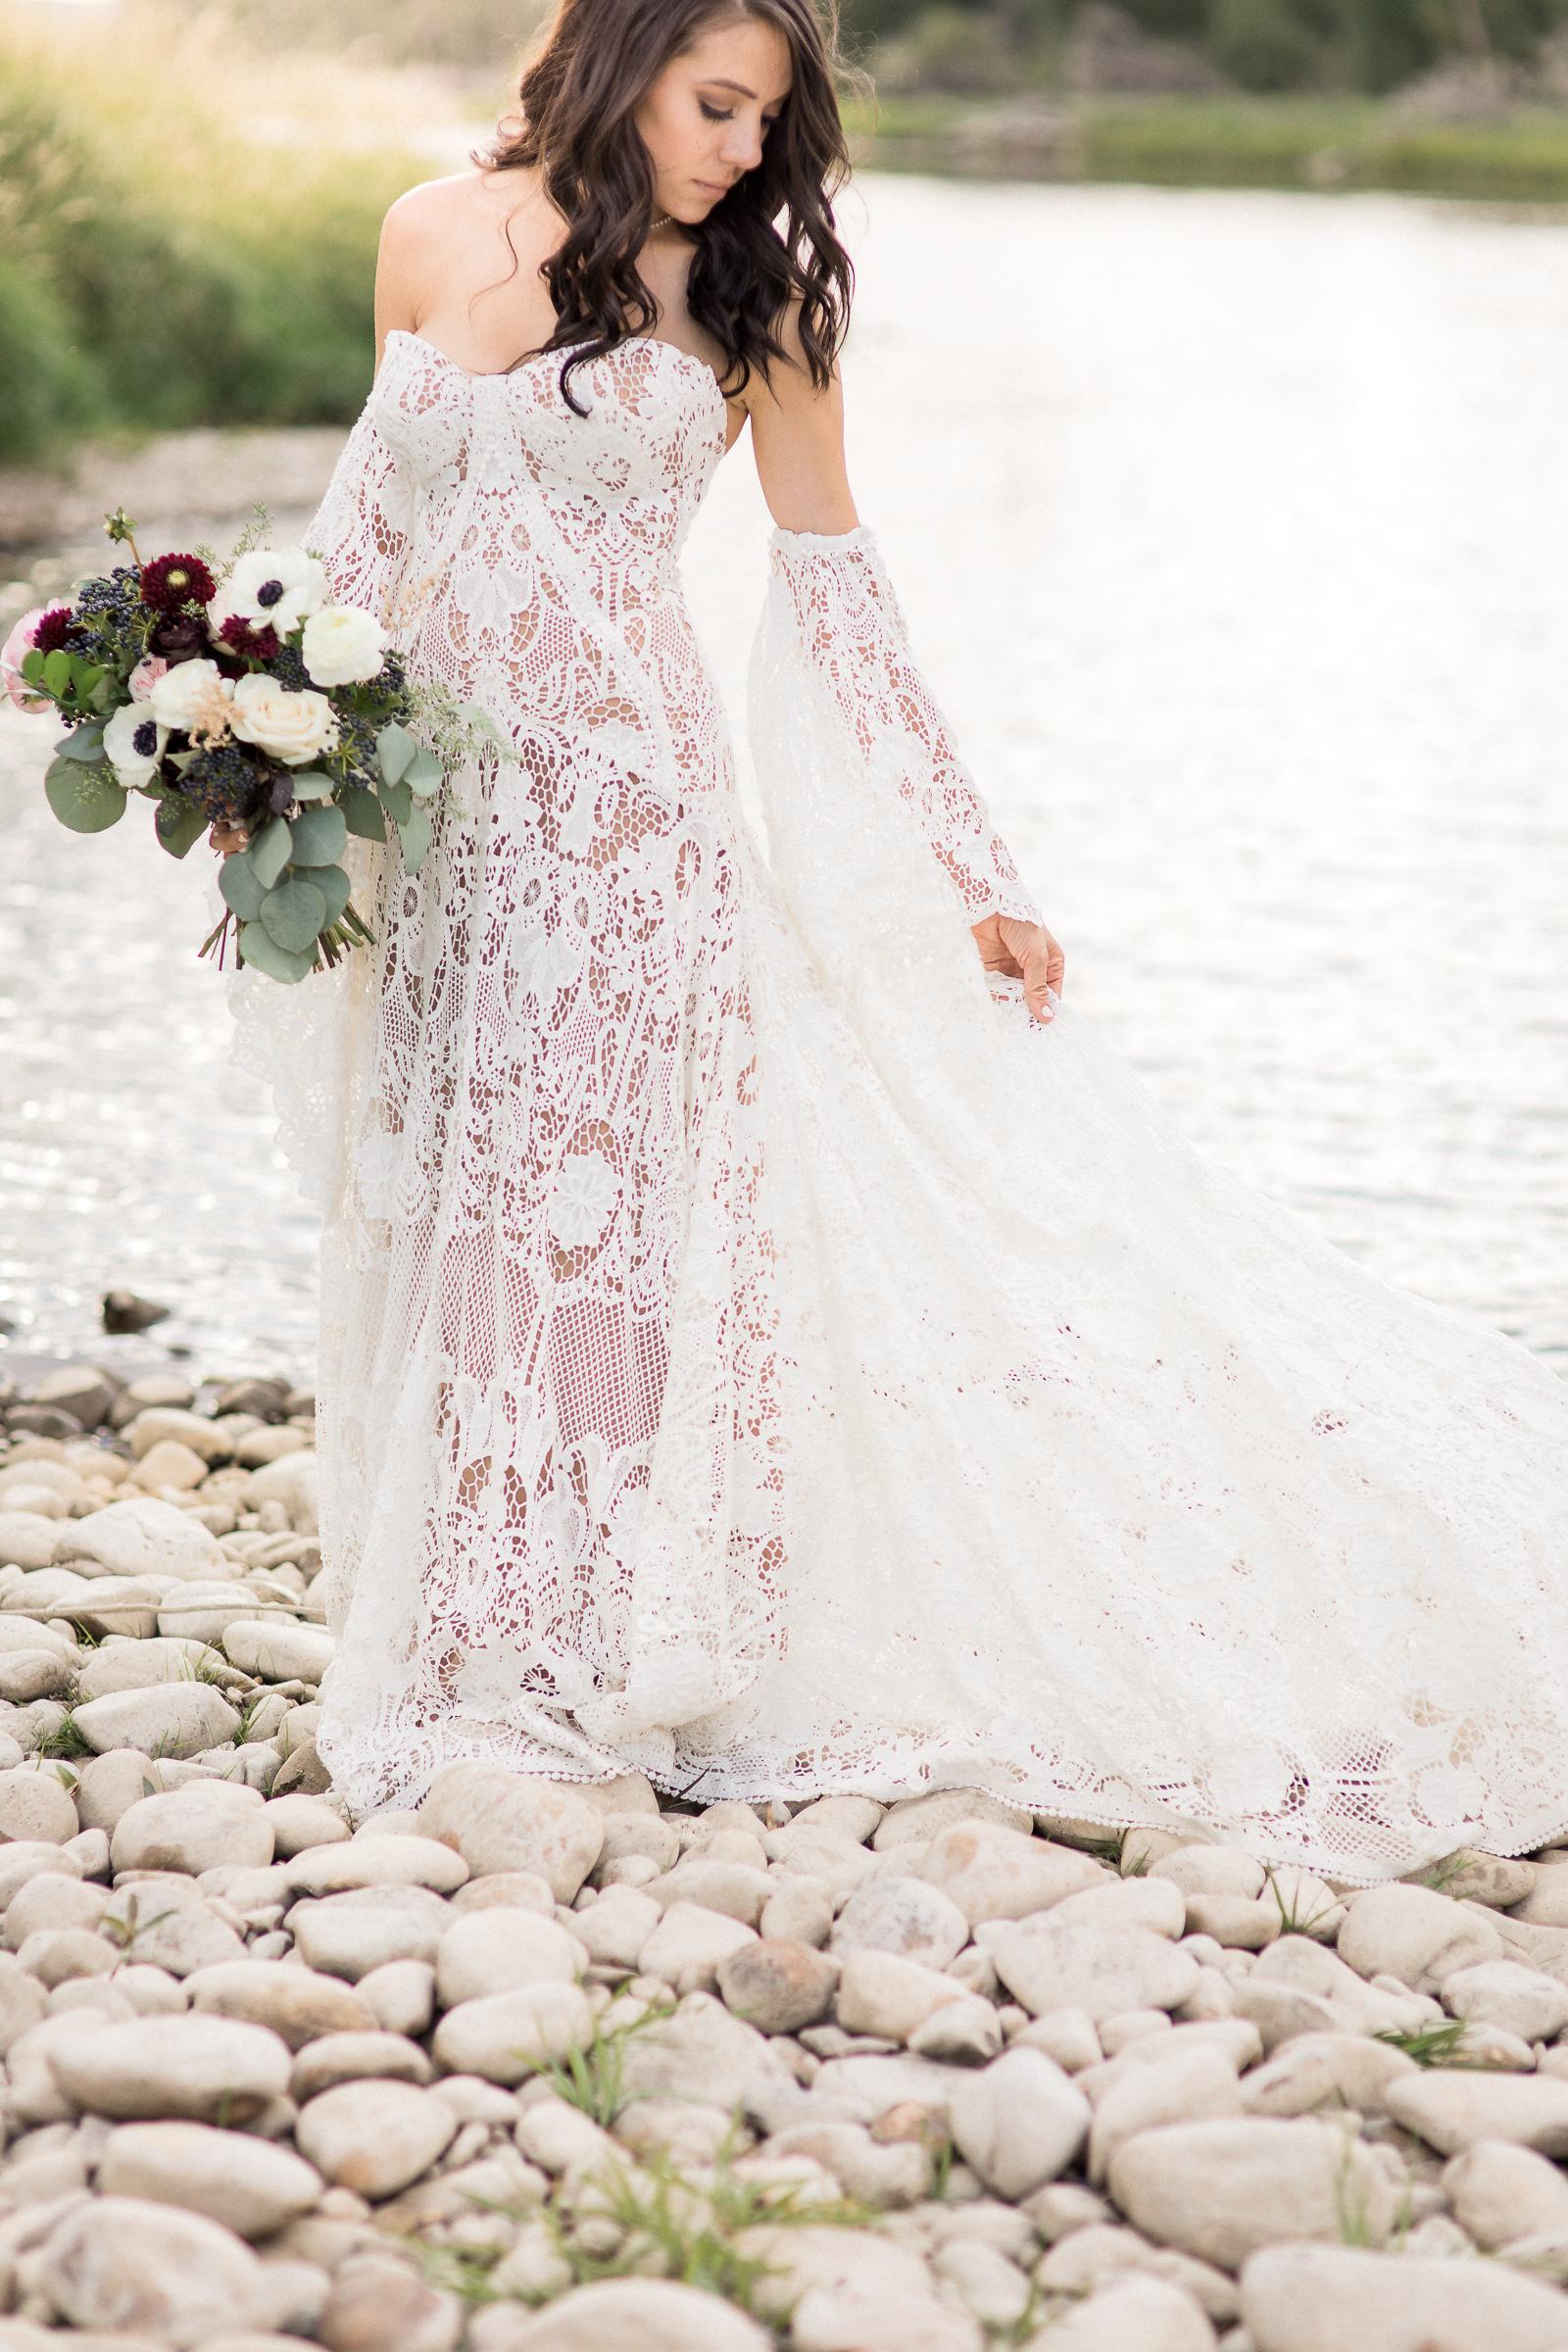 White strapless lace boho wedding gown